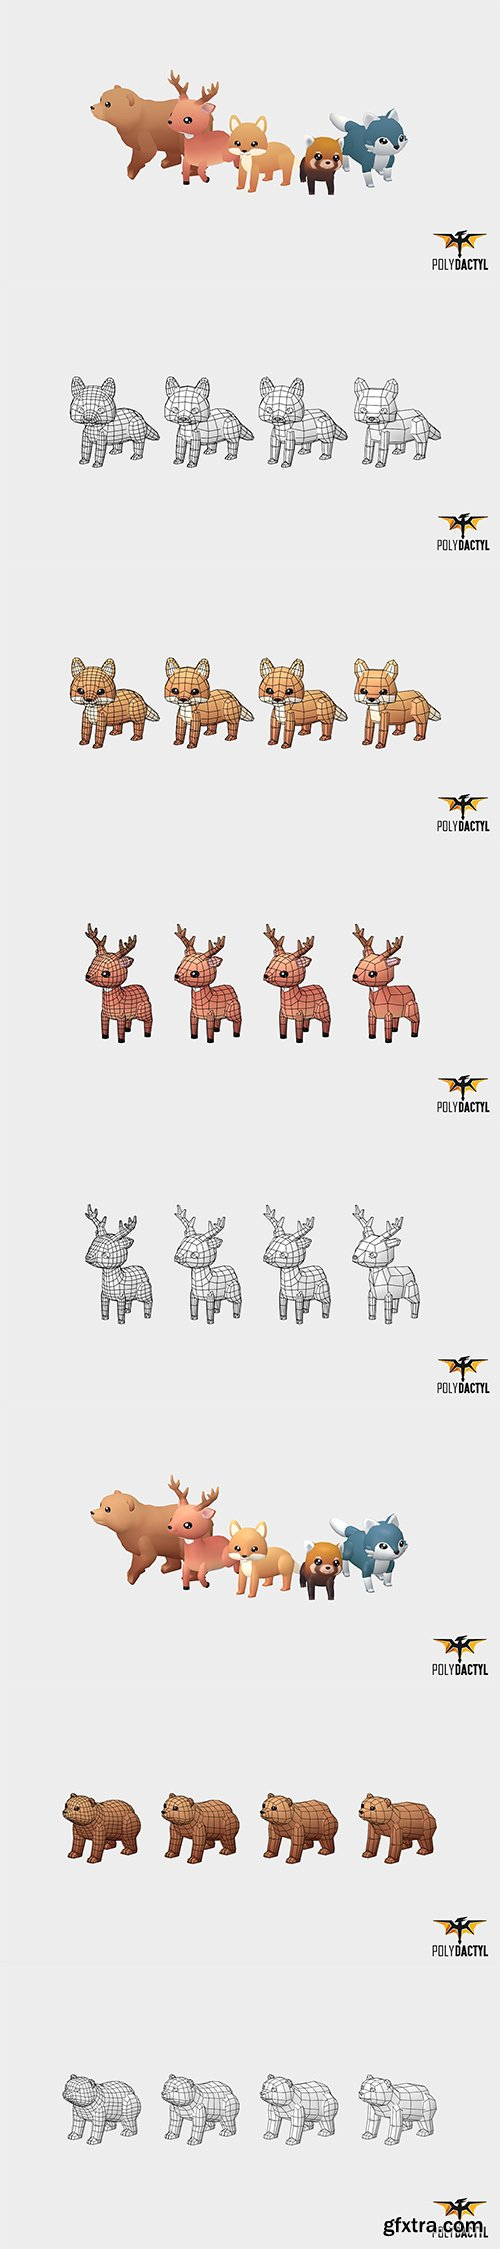 Cuberbrush - Forest Animals - Wild Series